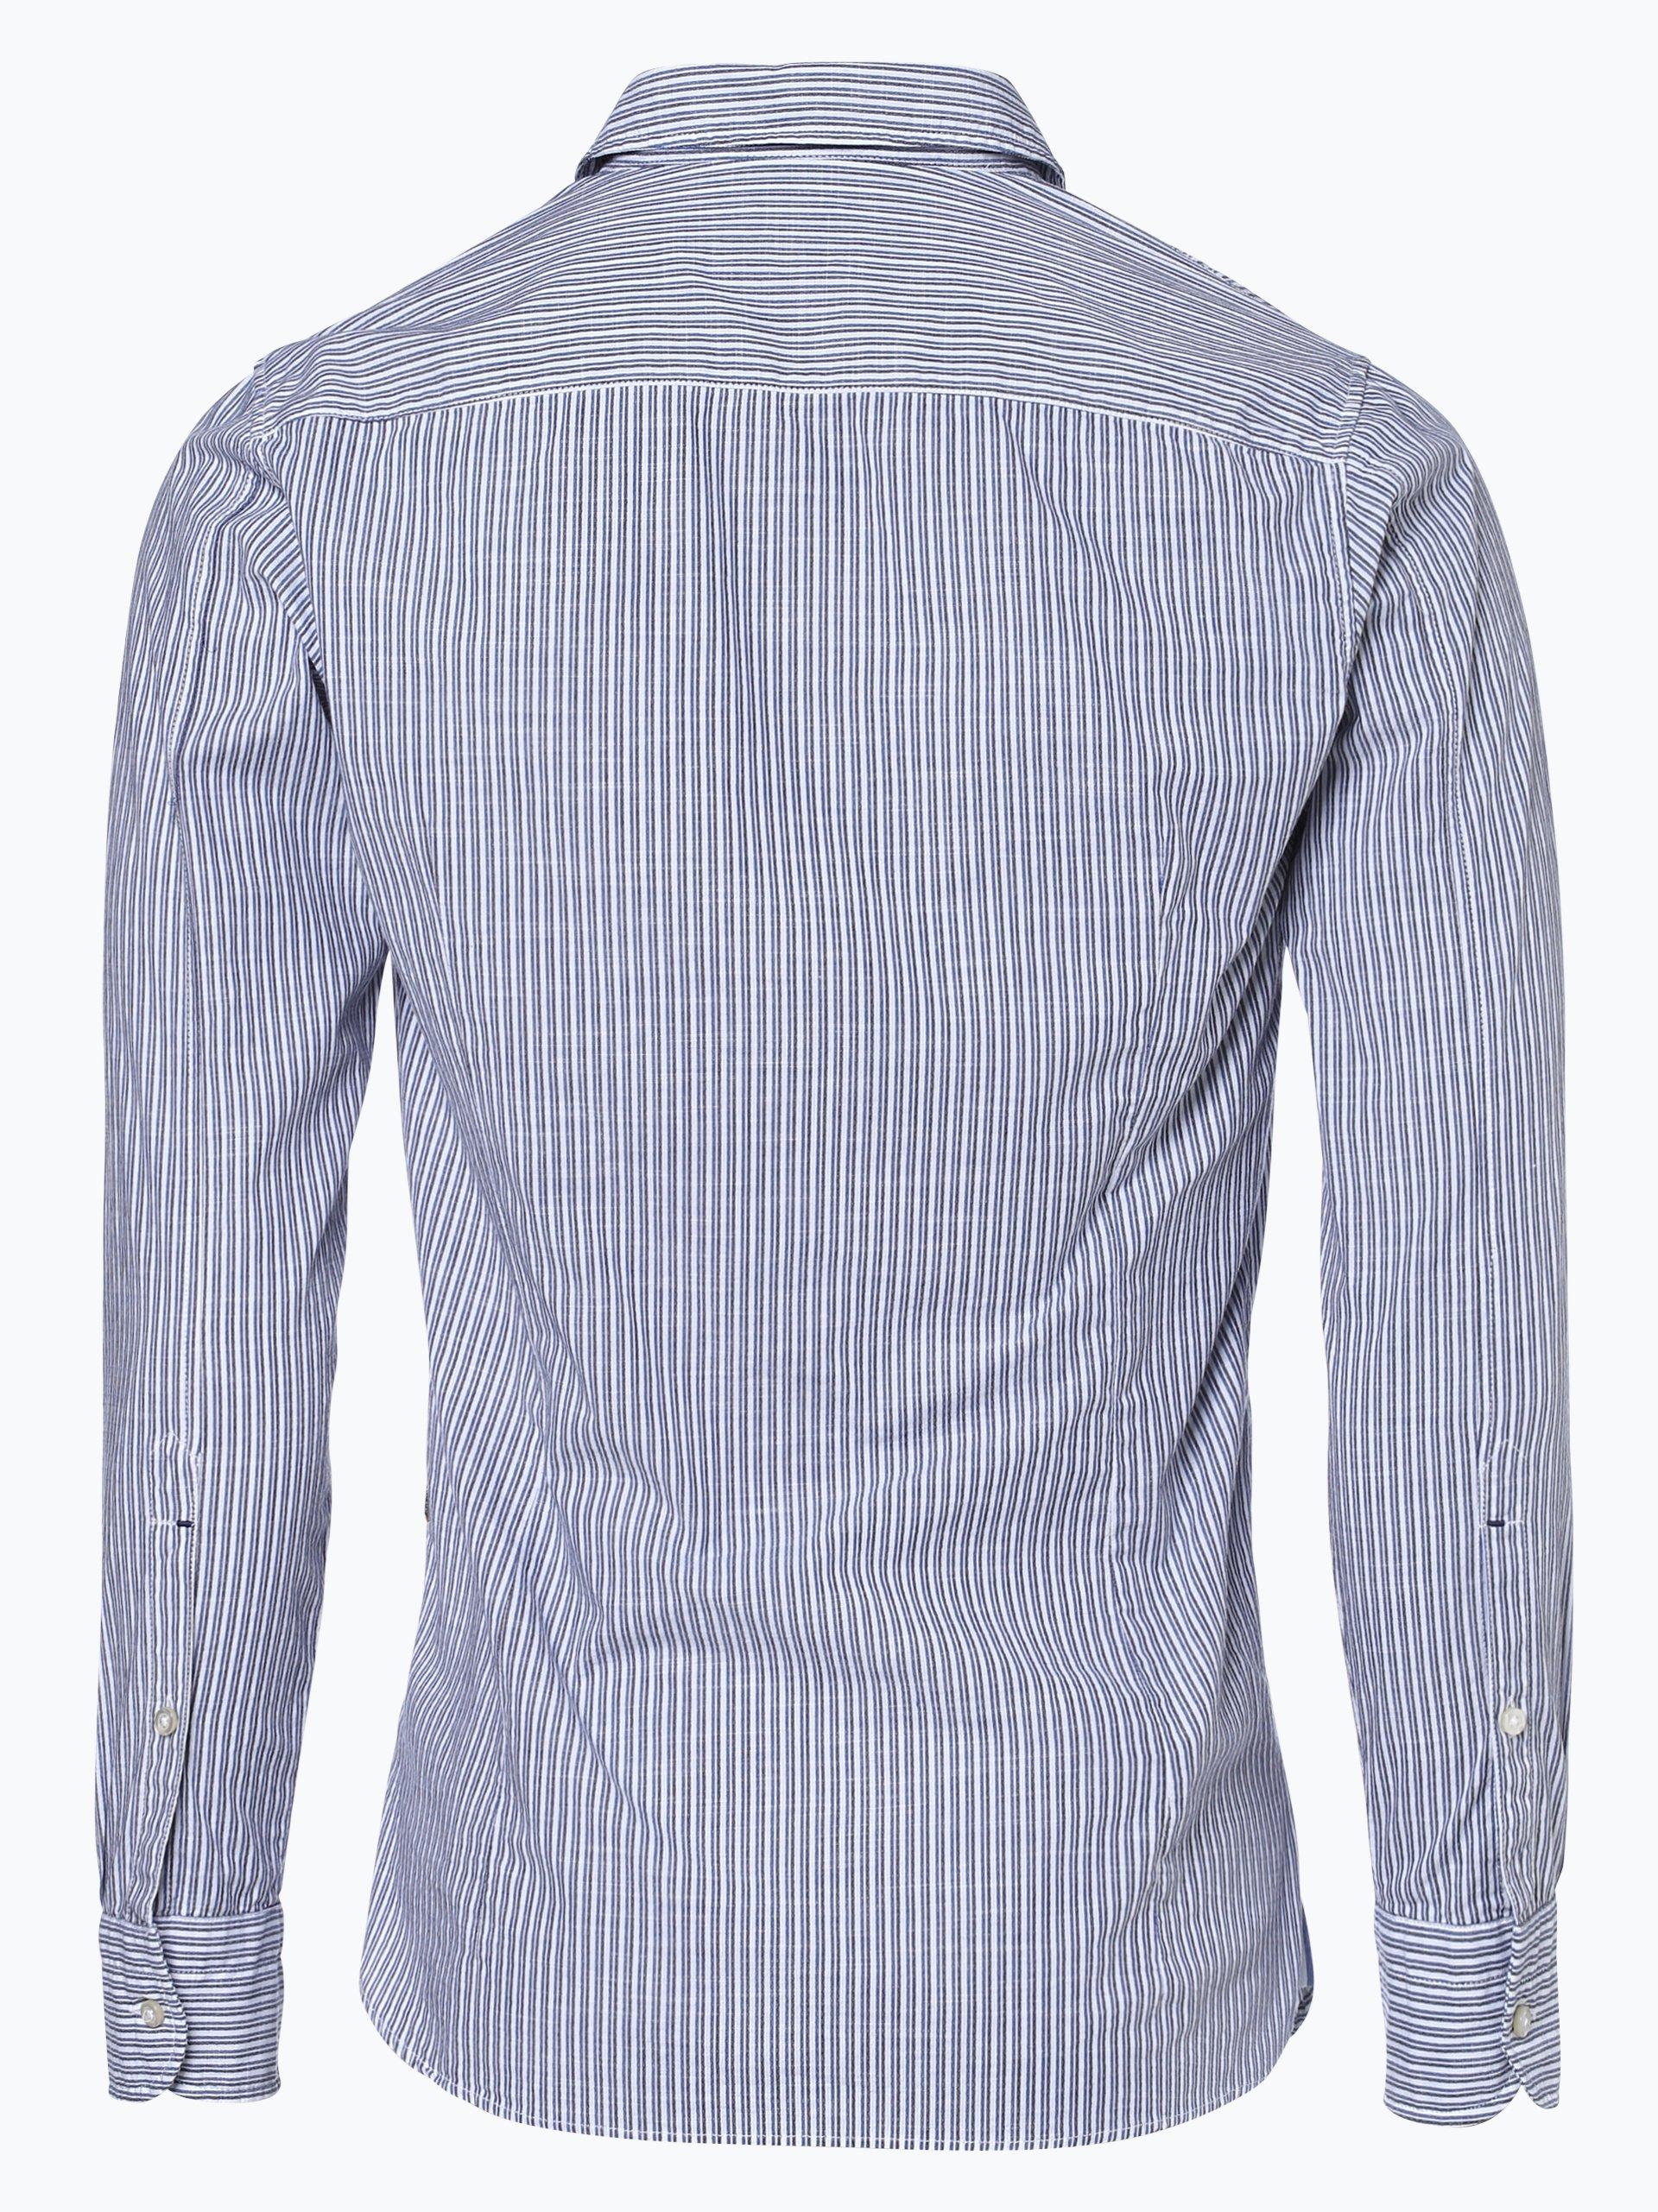 boss casual herren hemd cattitude 1 blau gestreift online kaufen peek und cloppenburg de. Black Bedroom Furniture Sets. Home Design Ideas